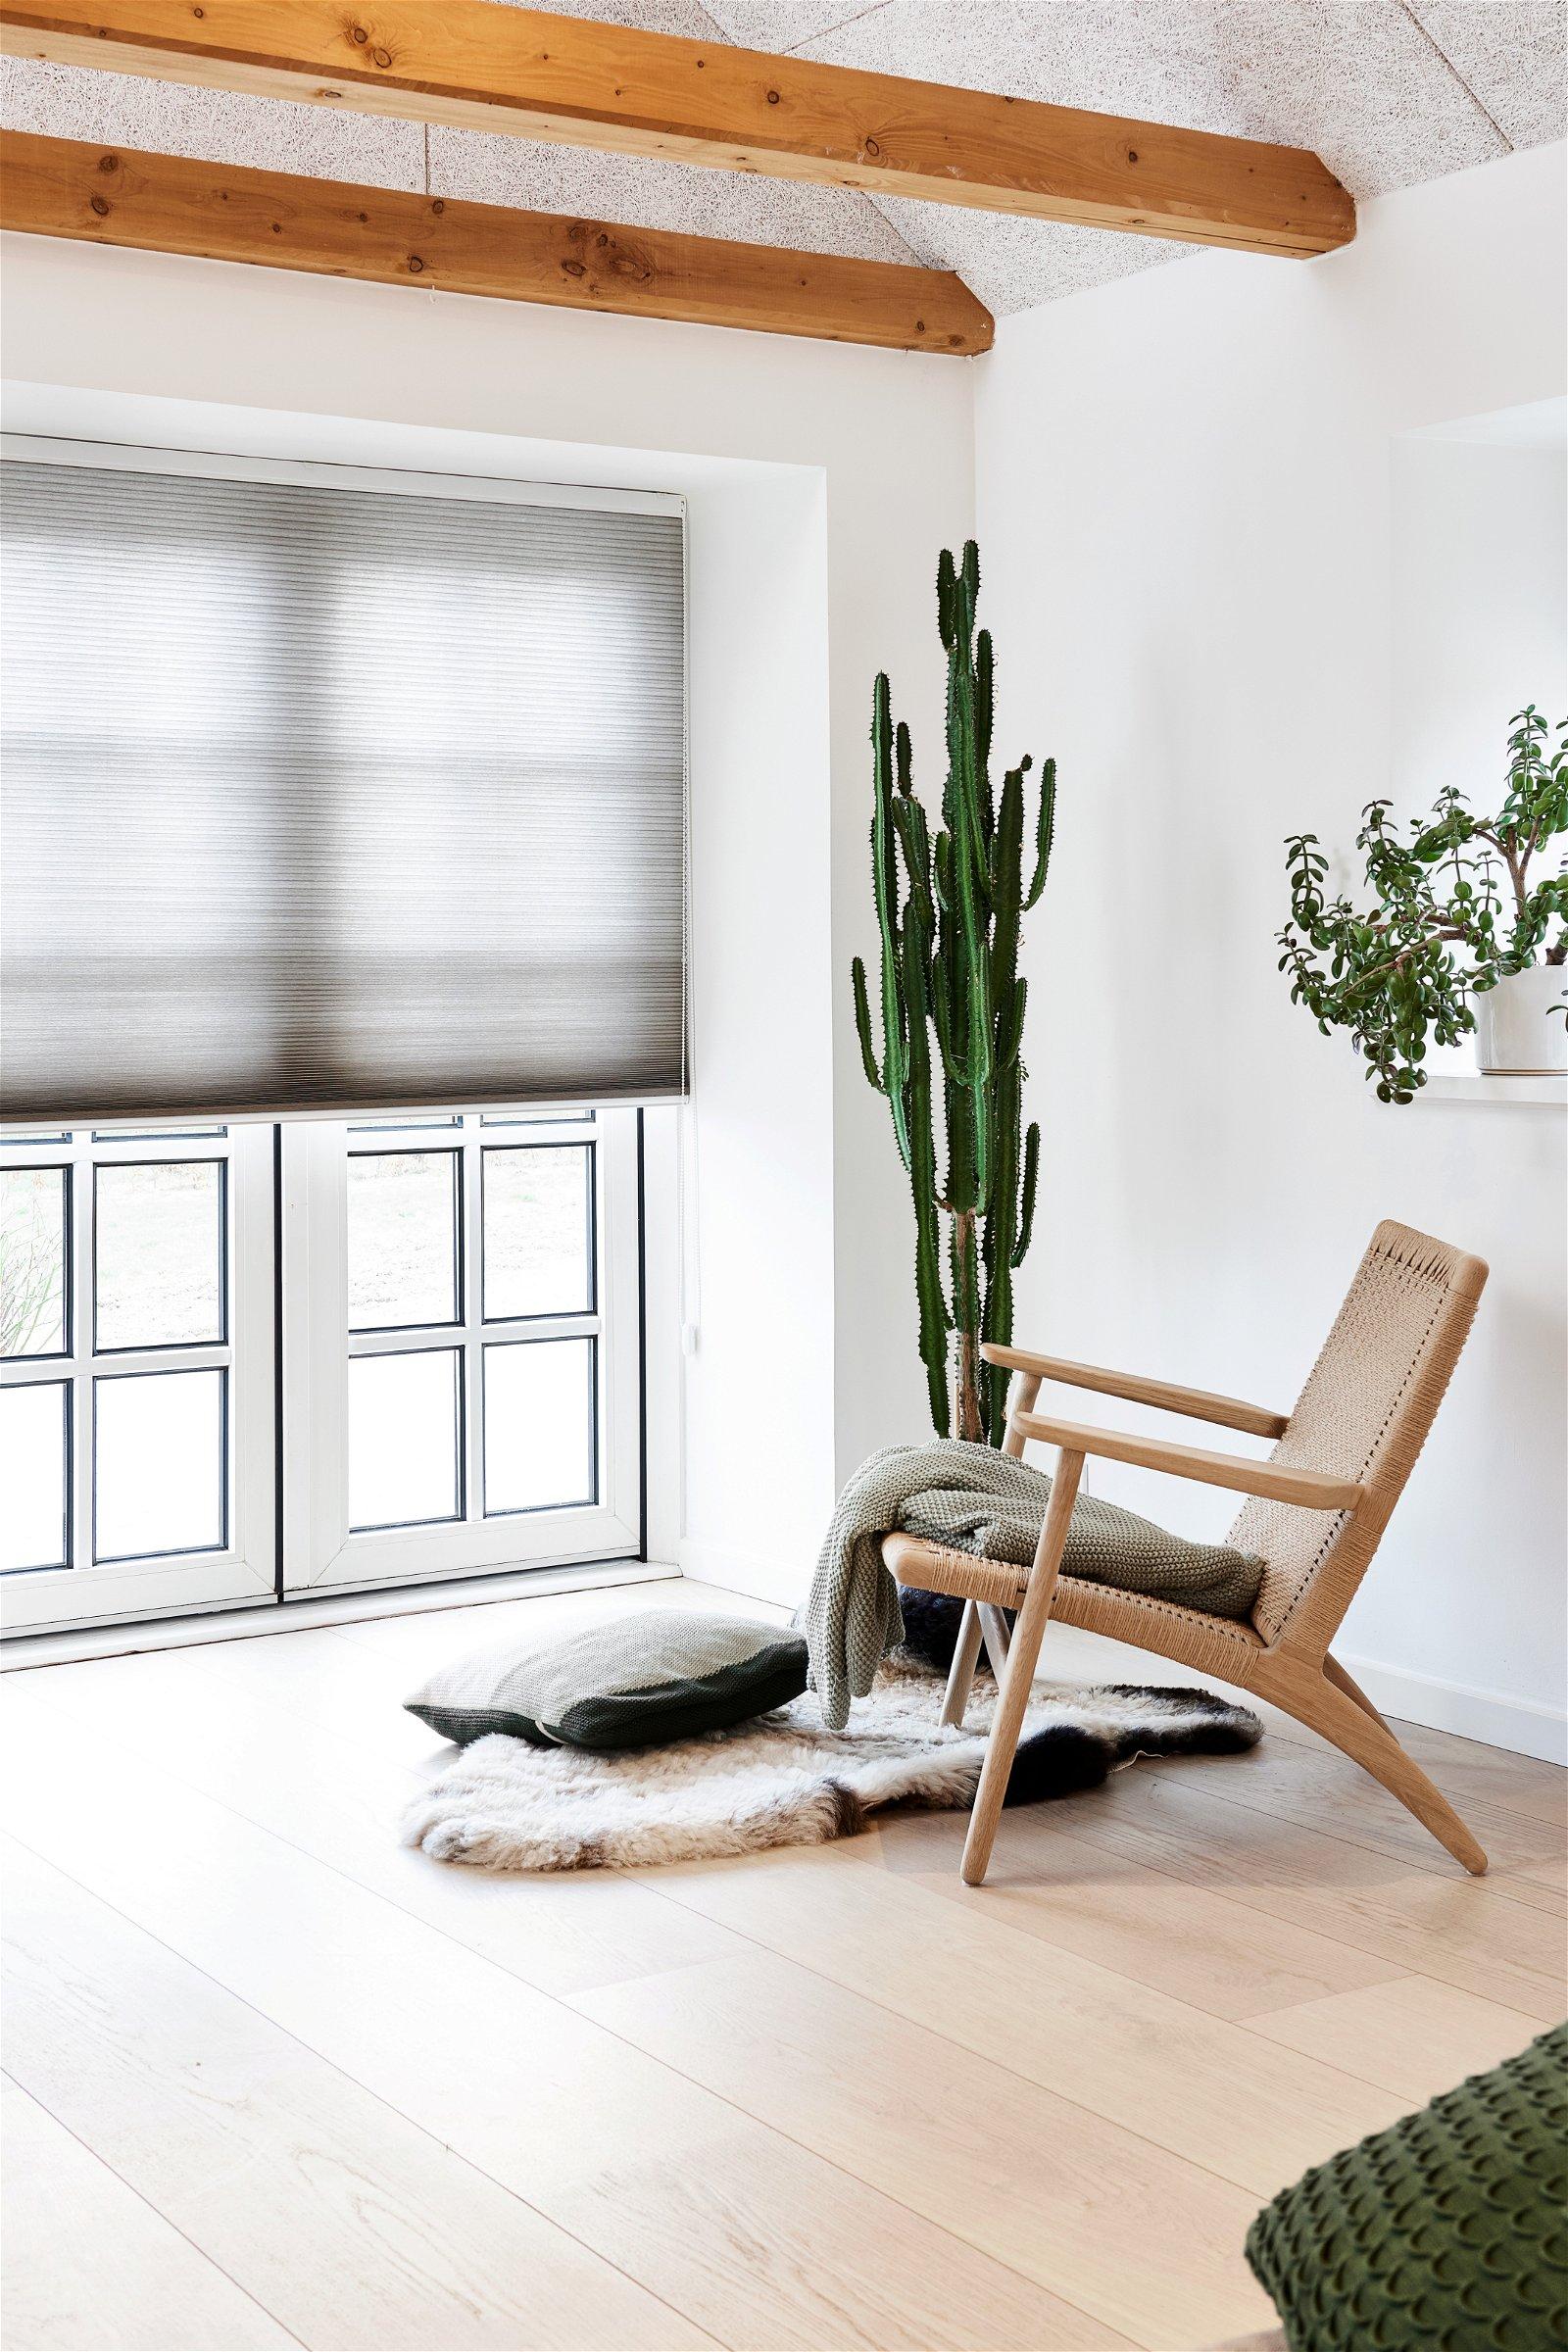 Nordic Shades® Dobbelt plisségardin m. Kædetræk